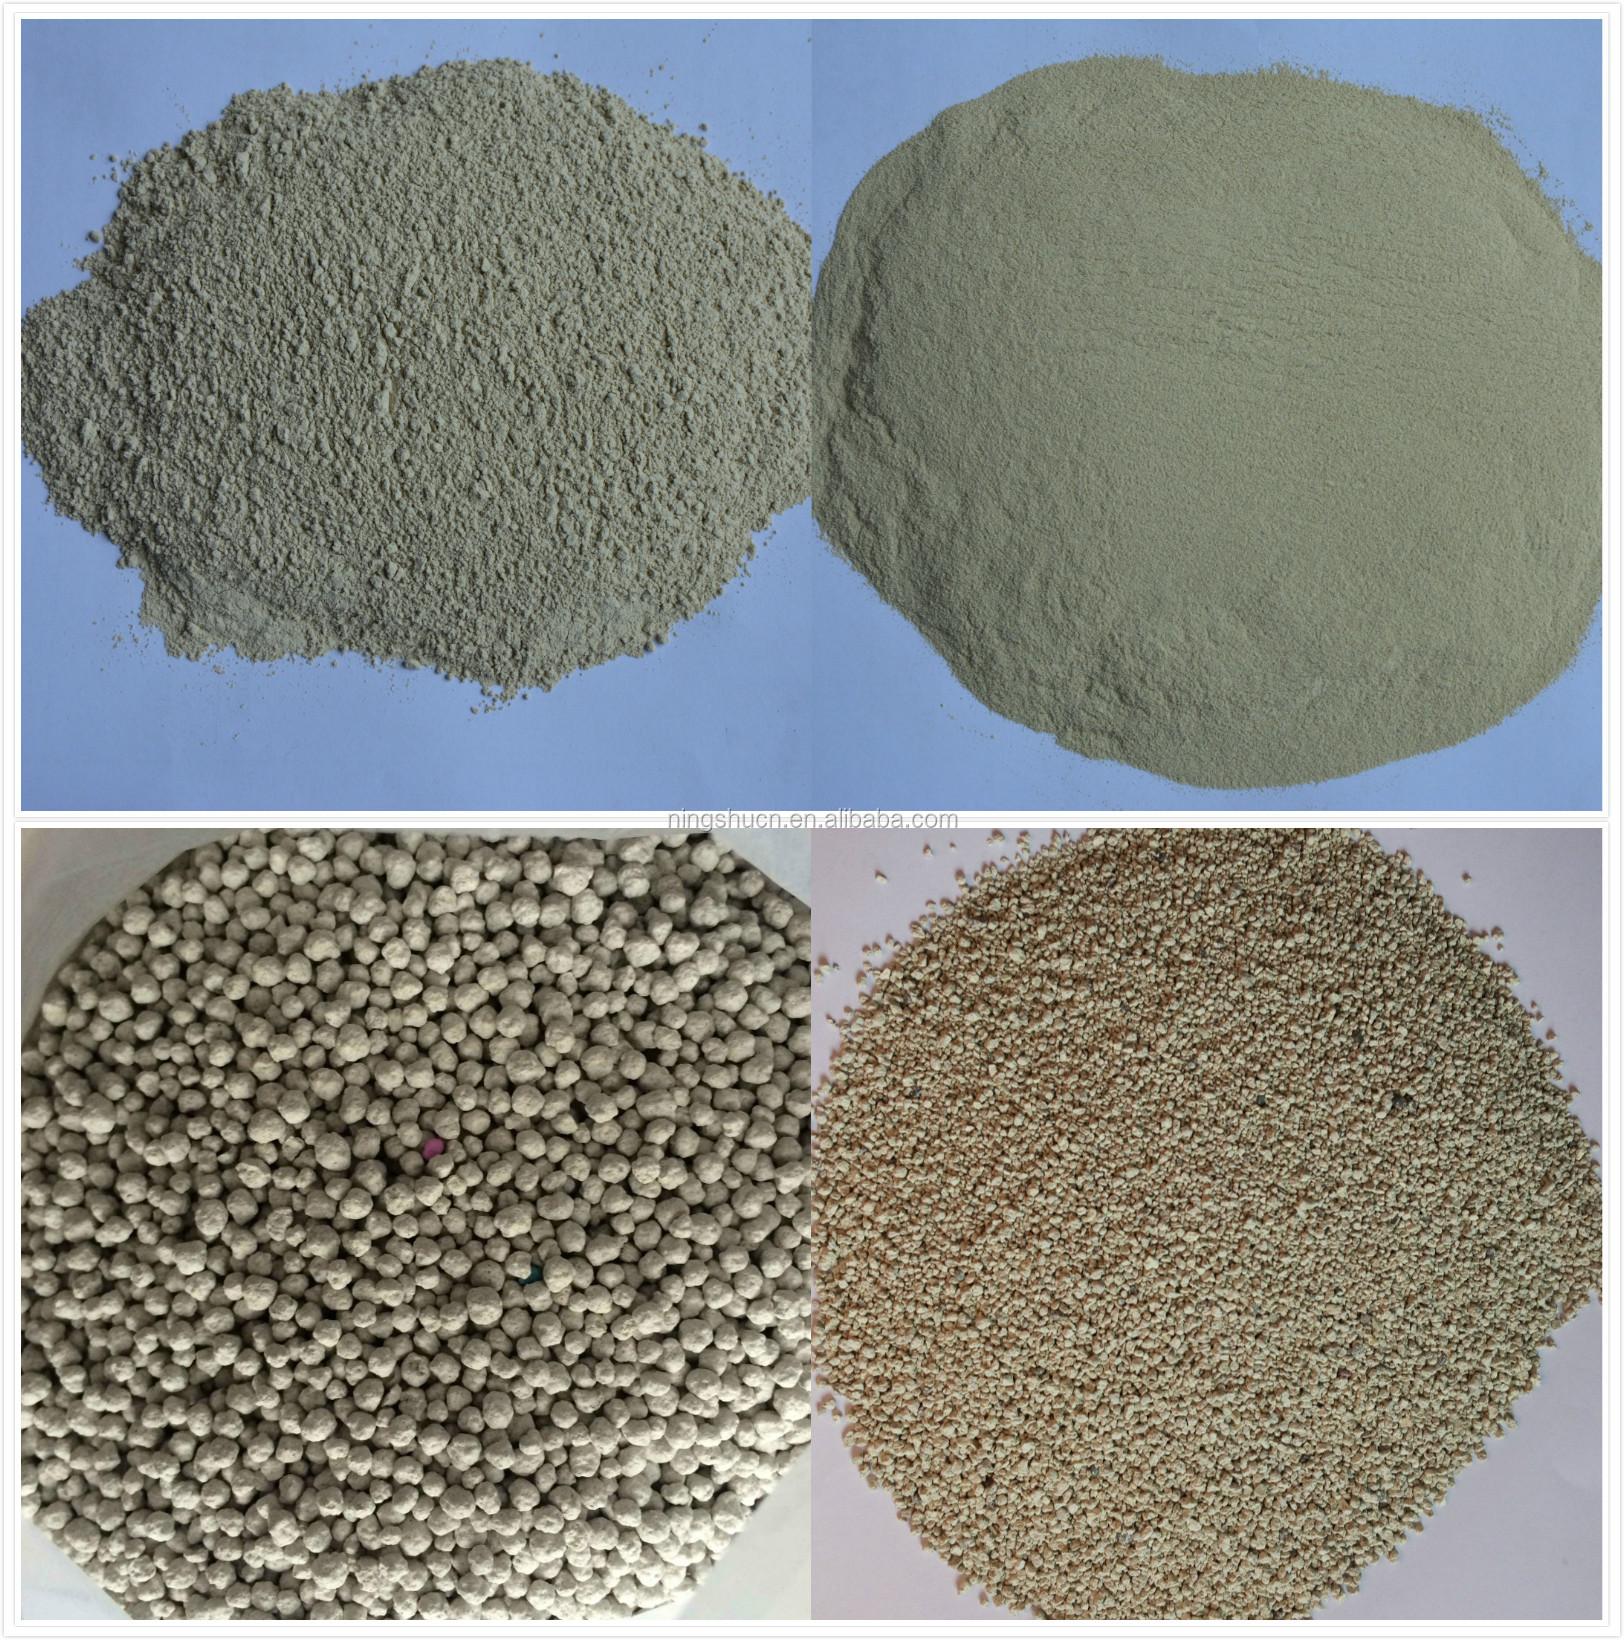 Sodium And Calcium Bentonite Clay Powder And Granules